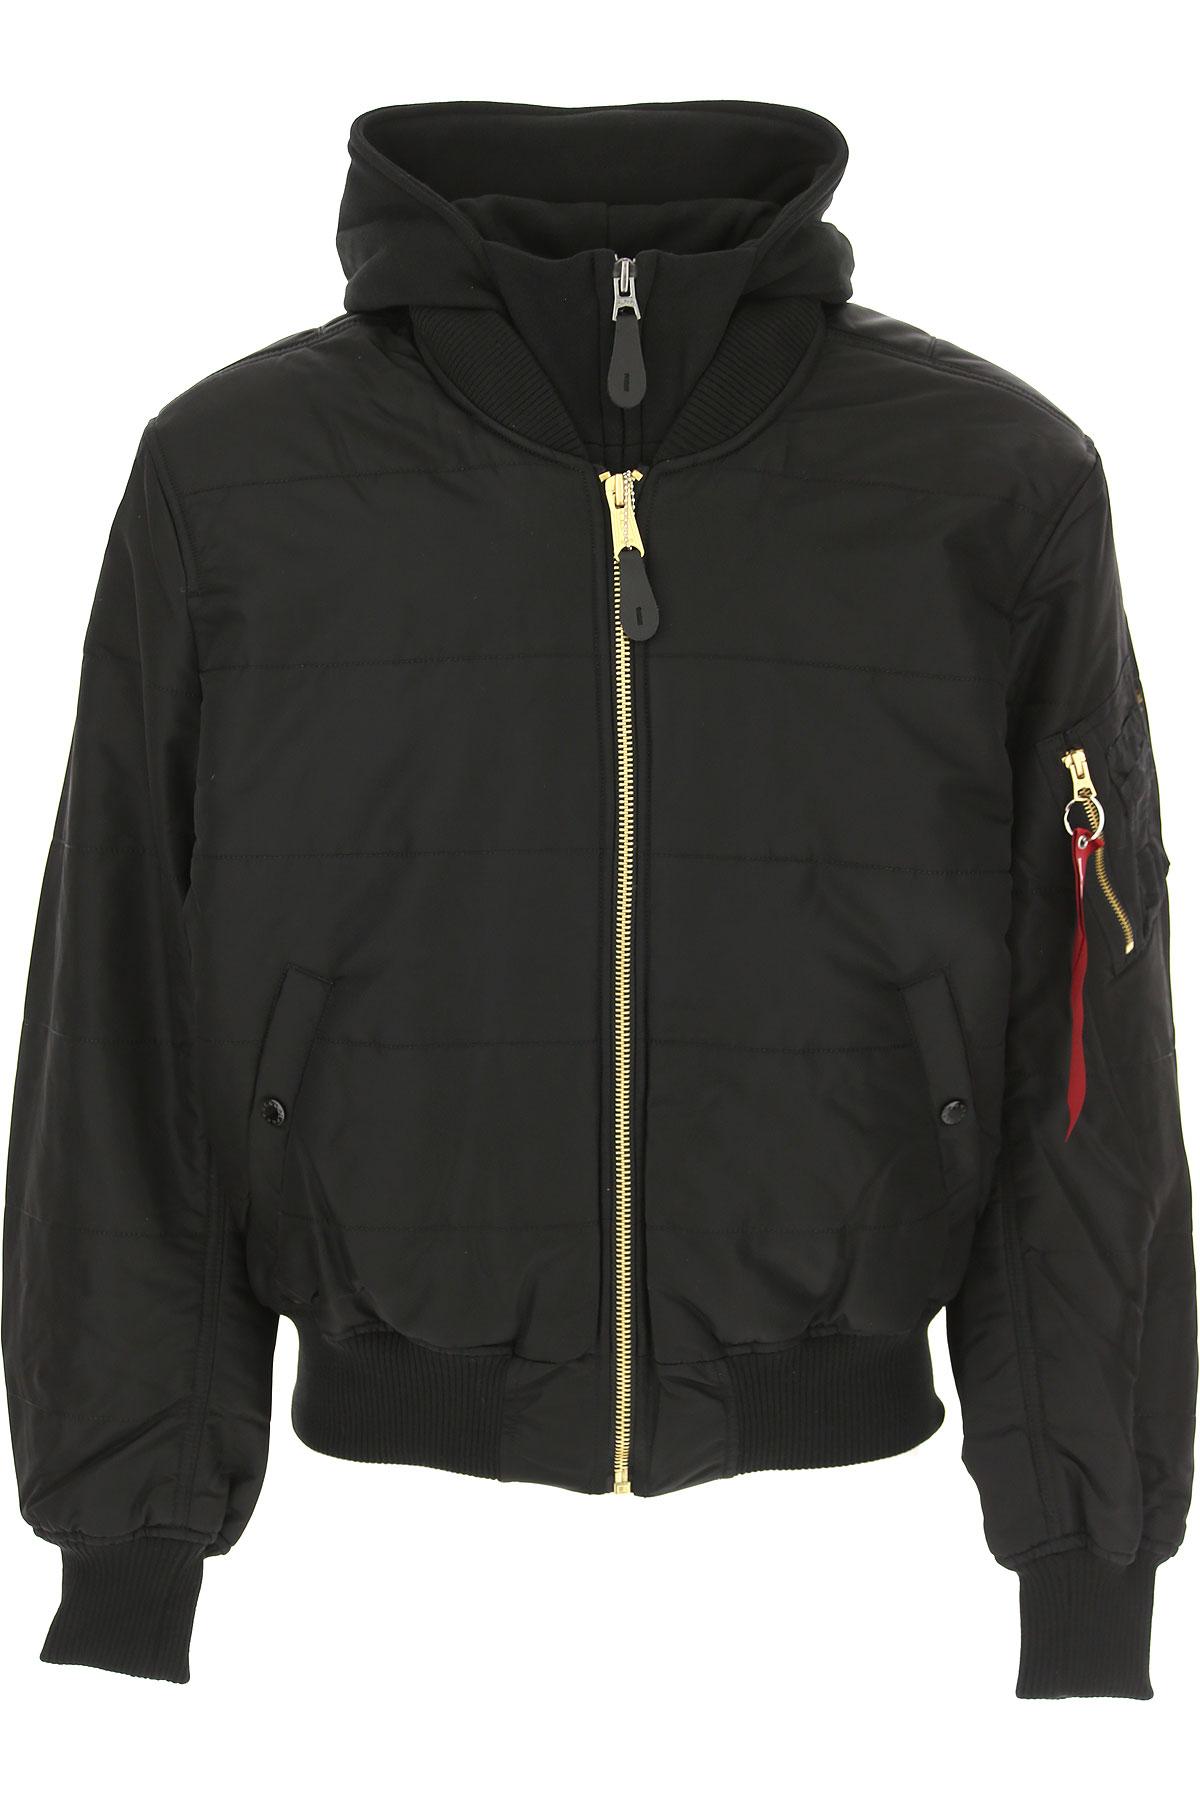 Image of Alpha Industries Jacket for Men, Black, polyester, 2017, L M S XL